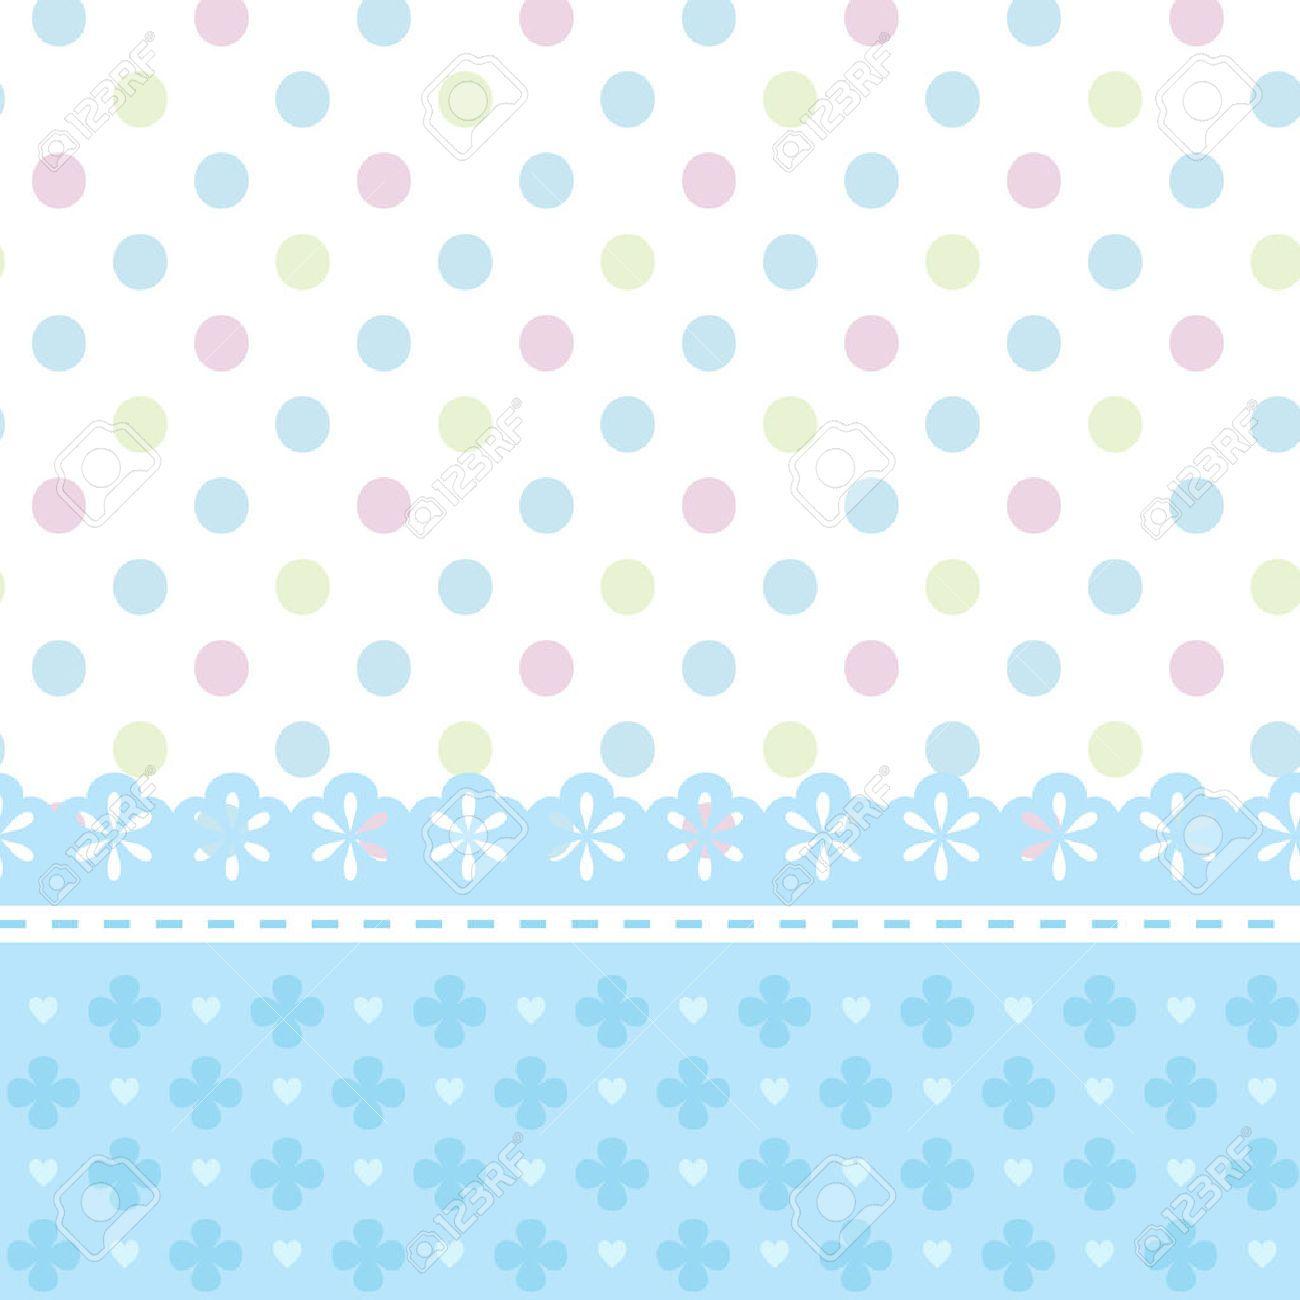 Fondos de baby shower niño - Imagui | Baby shower | Pinterest ...